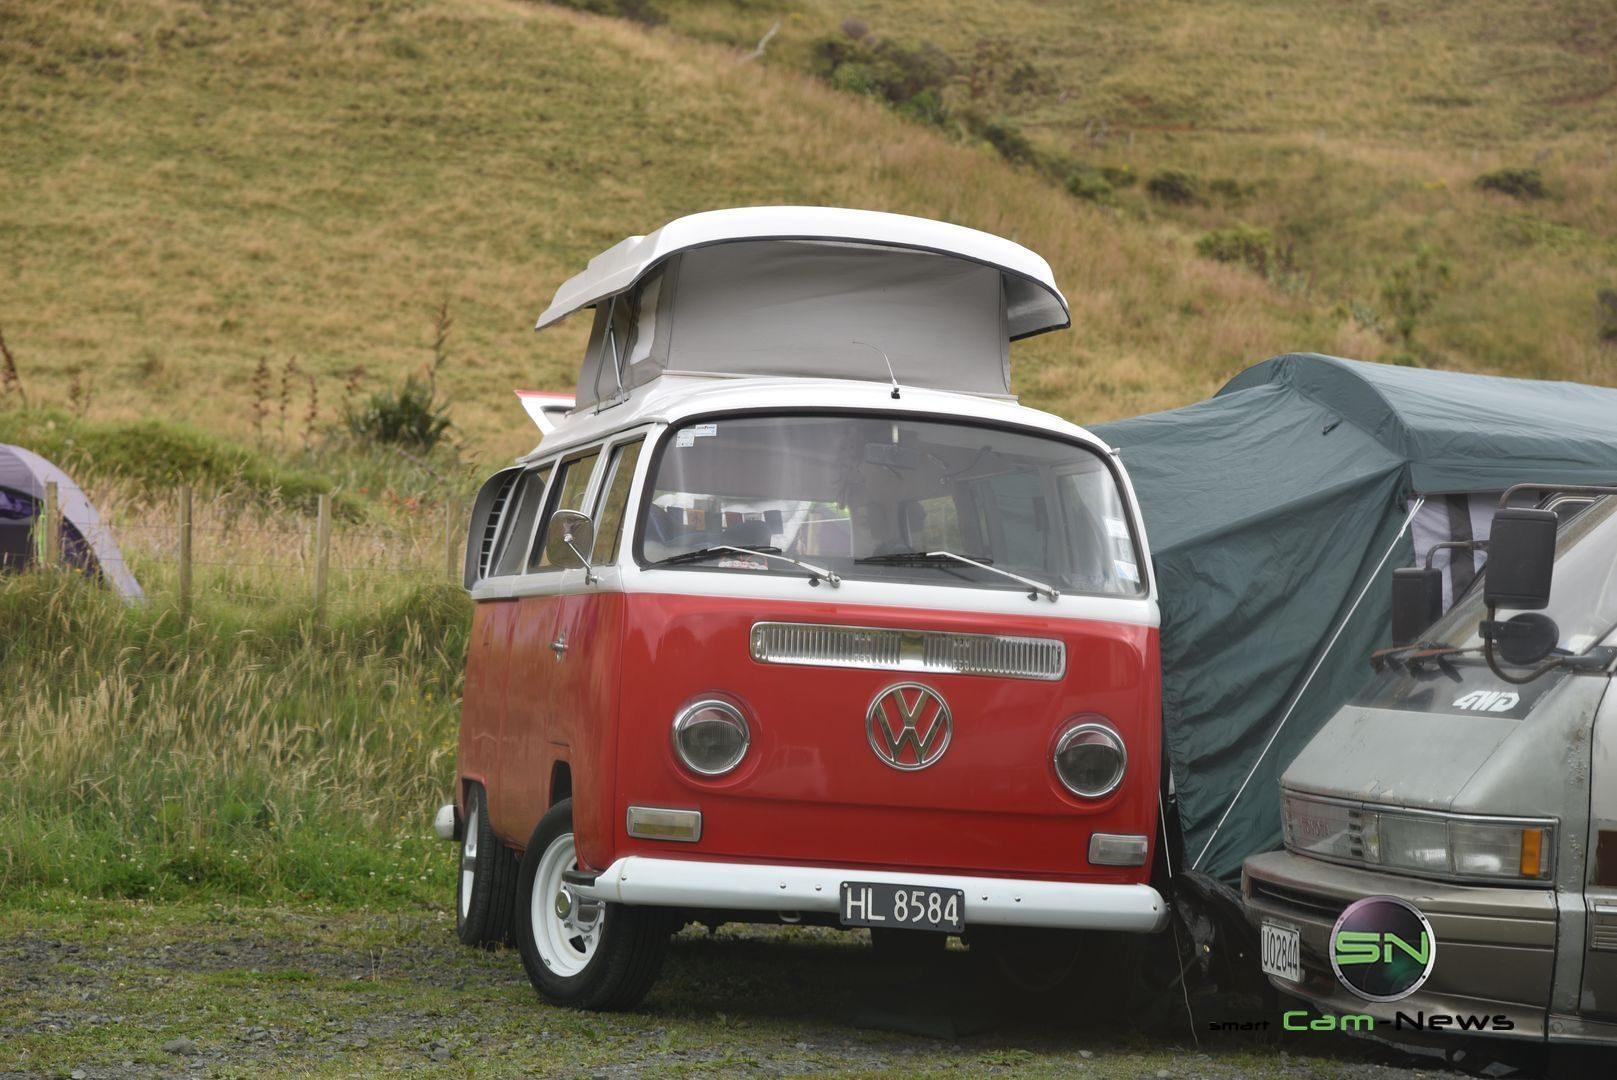 Camping in Neuseeland - VW Bully - Nikon D750 - SmartCamNews